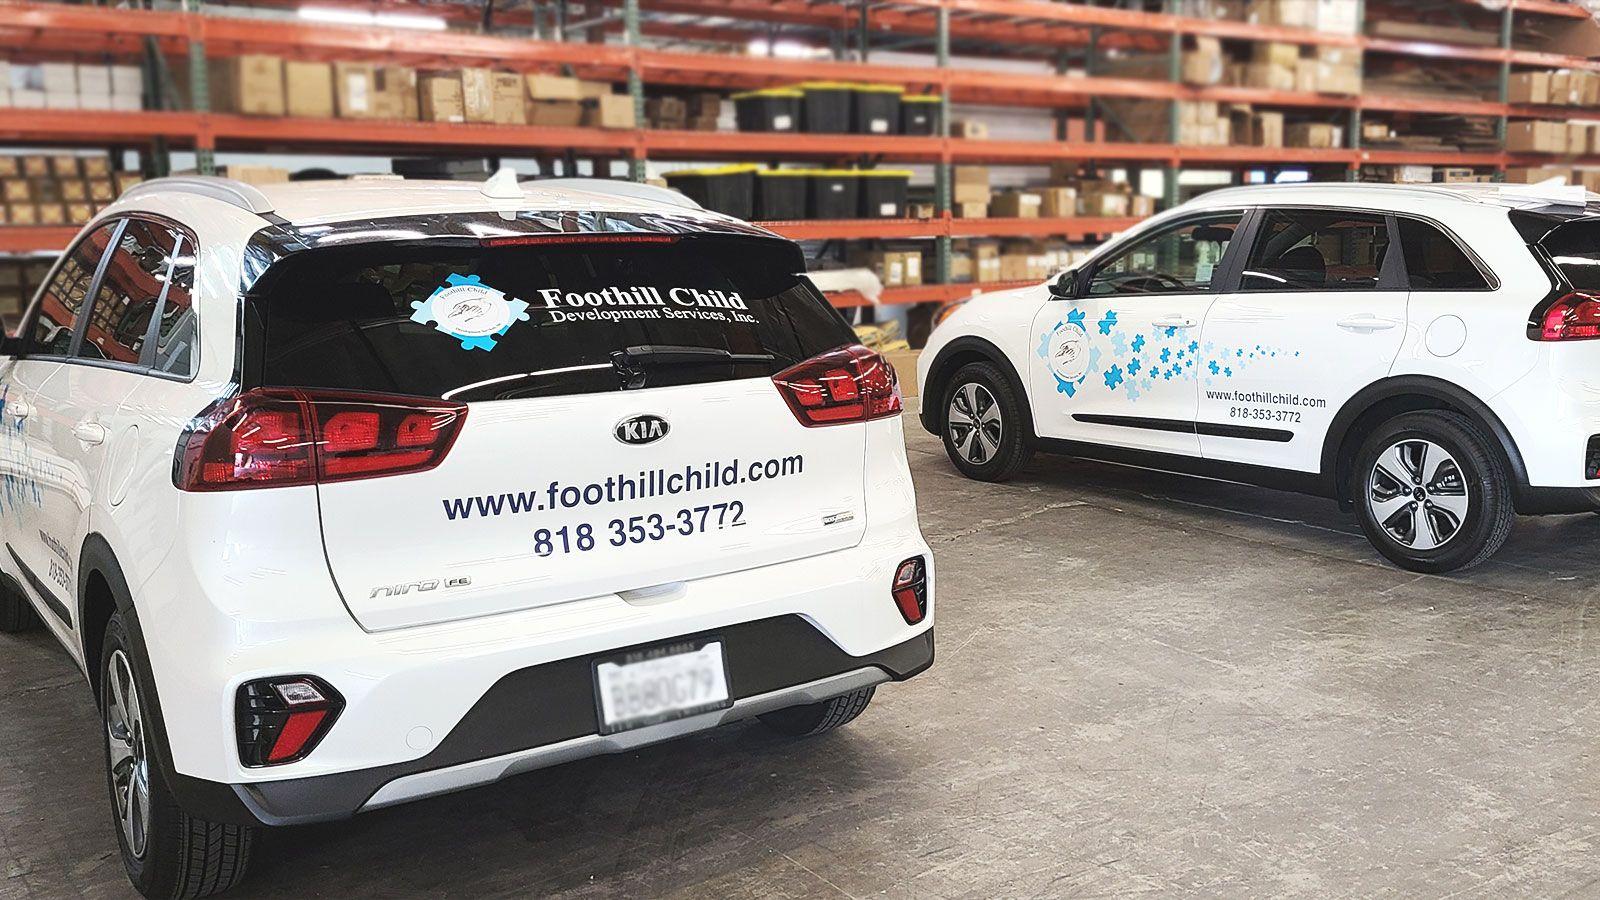 foothill child vehicles branding